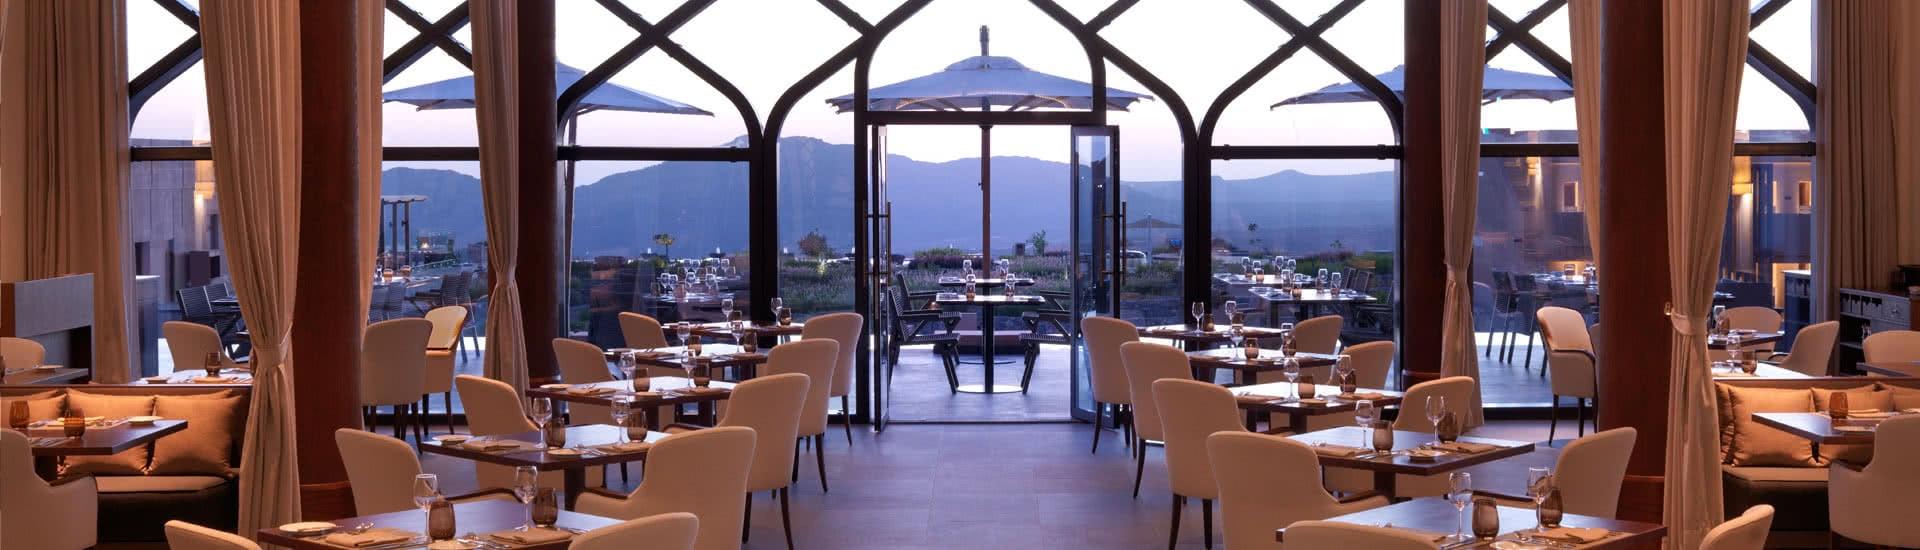 Luxury Dining Setup of Al Maisan Restaurant in Oman